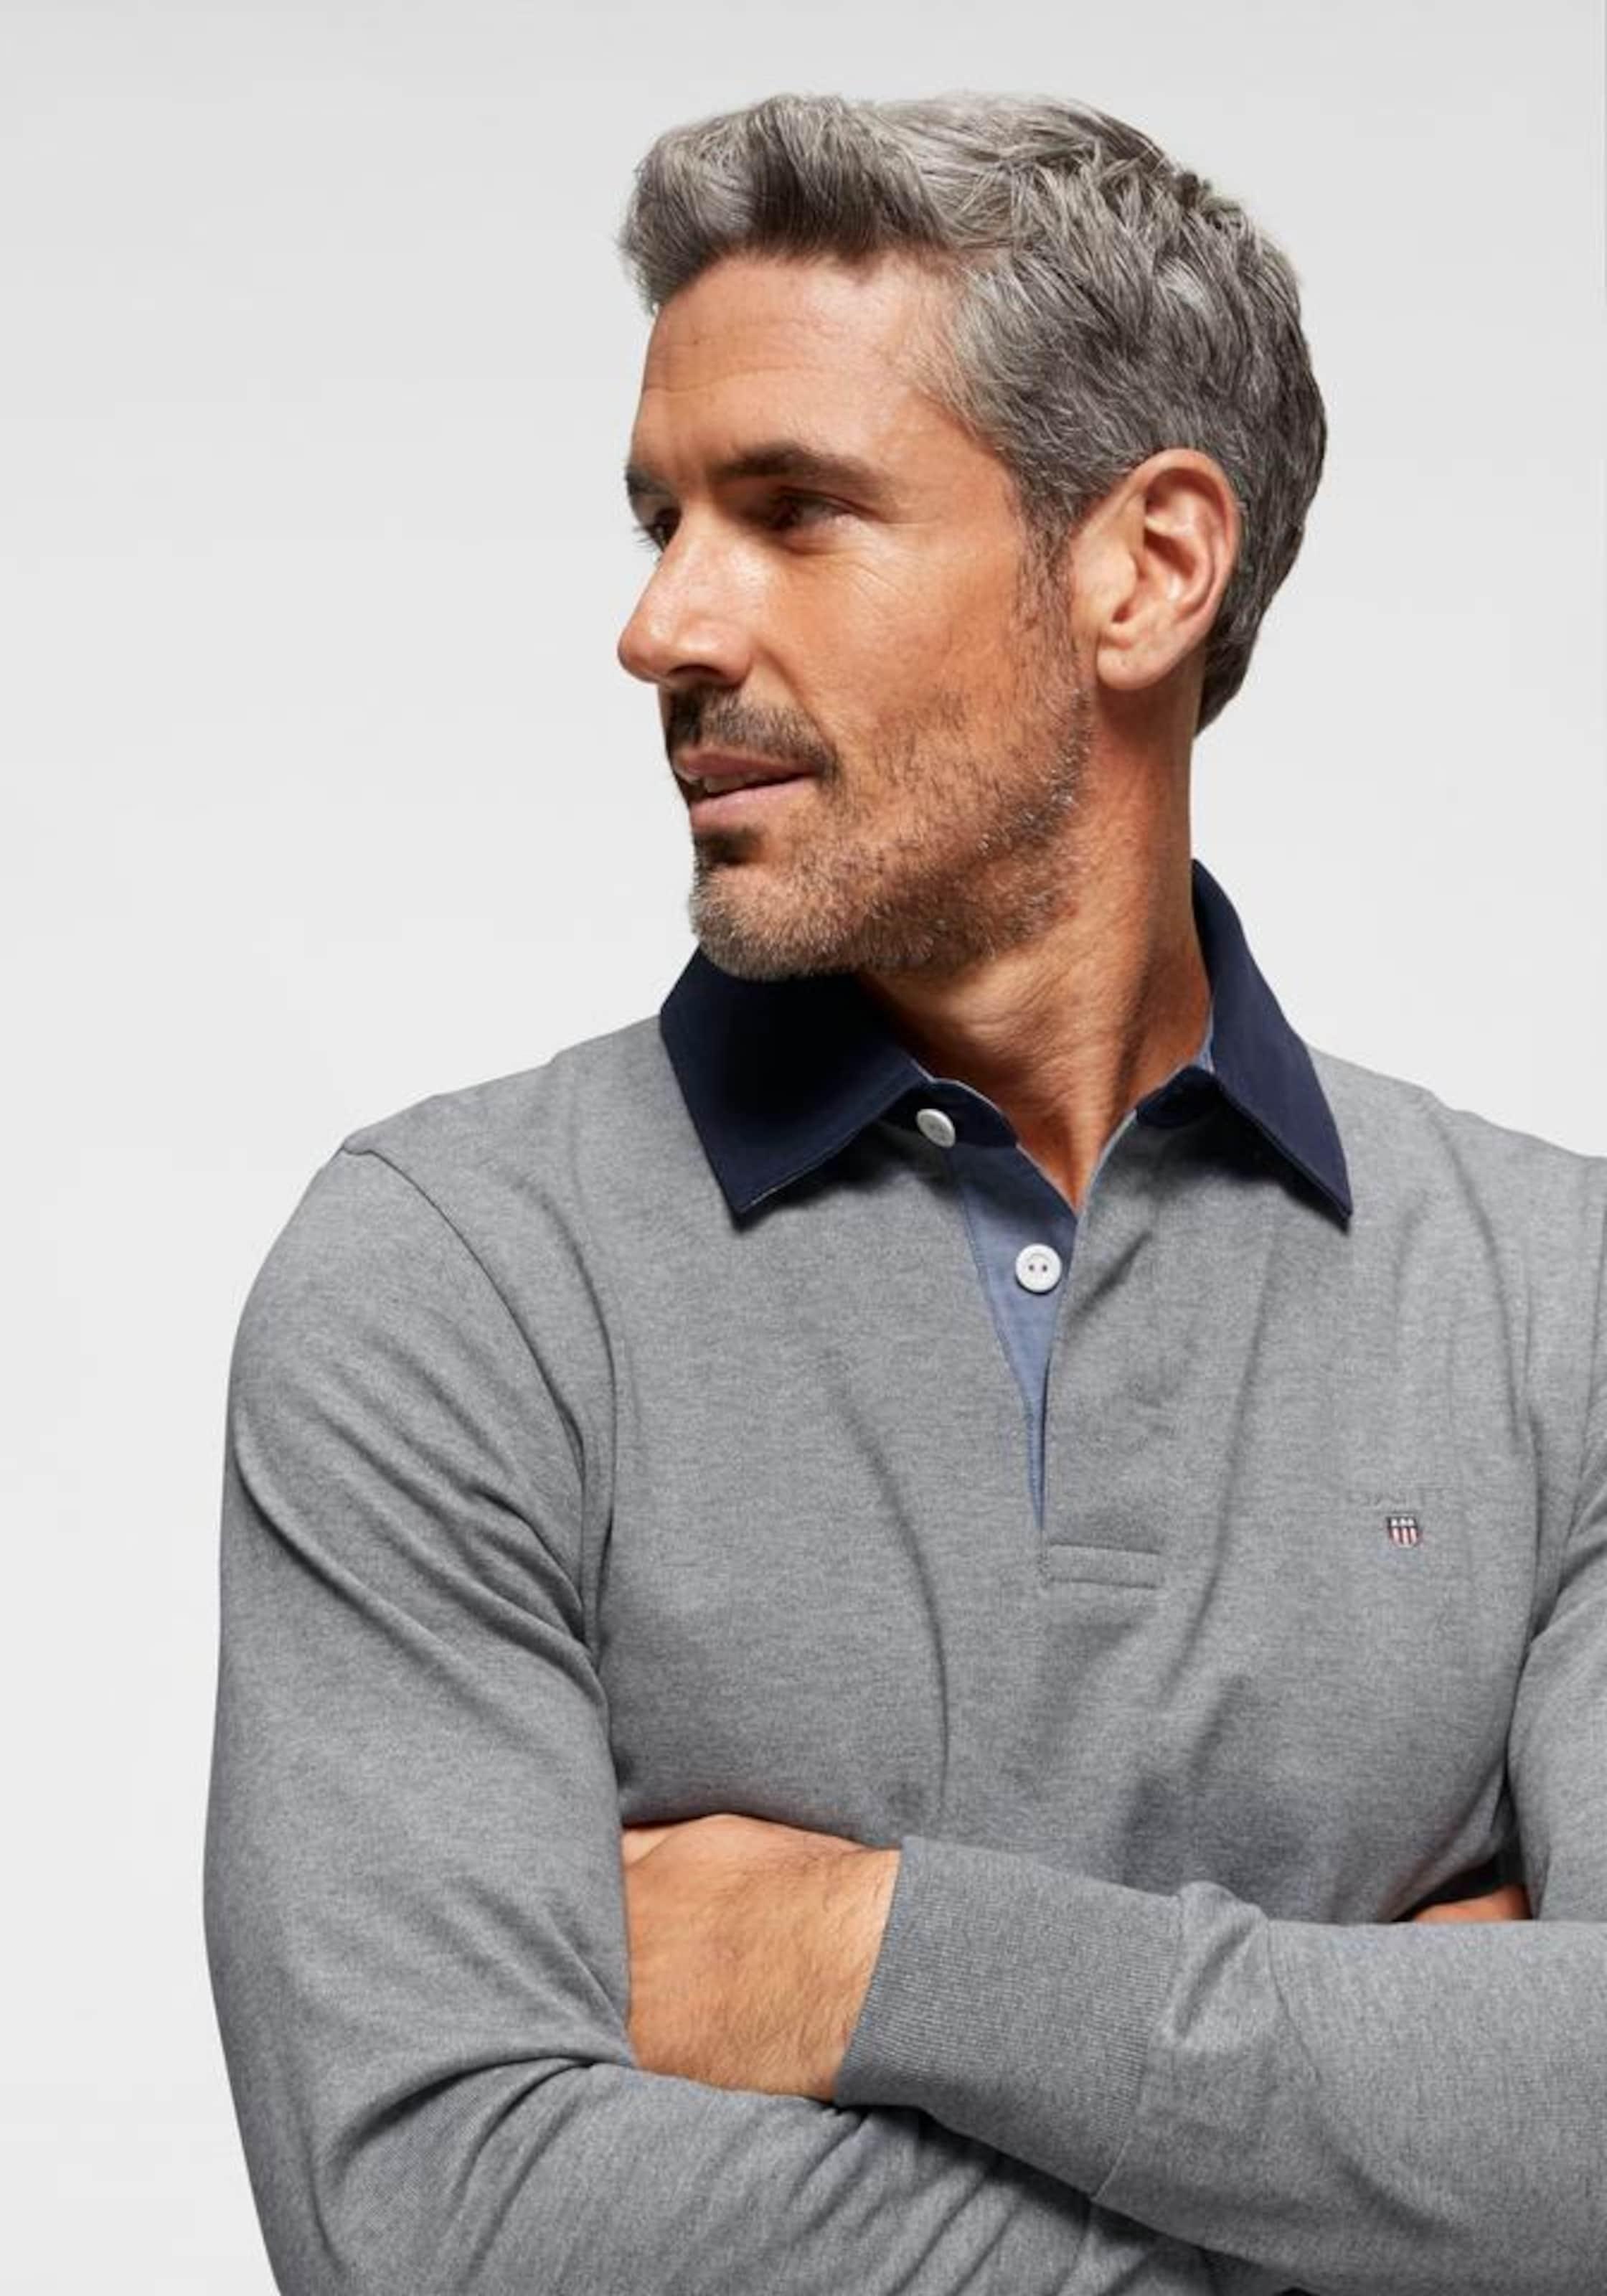 Shirt Graumeliert Rugger' Original In Gant 'the Heavy FJclK1